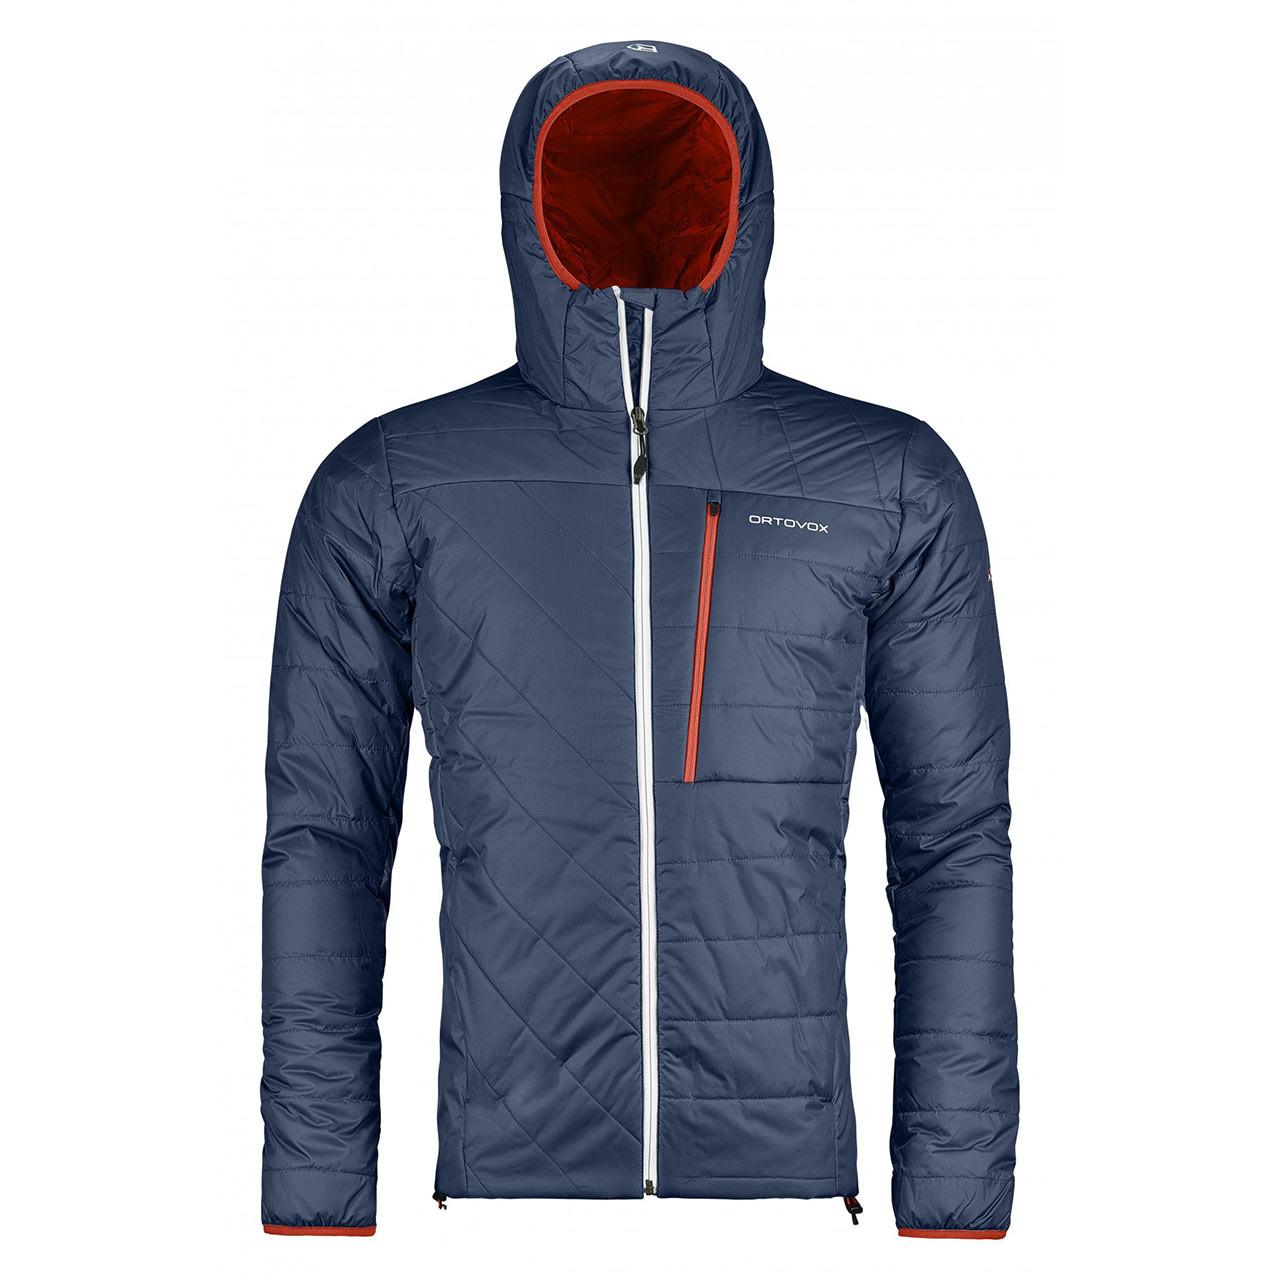 Street bunda Ortovox Piz Bianco Jacket night blue